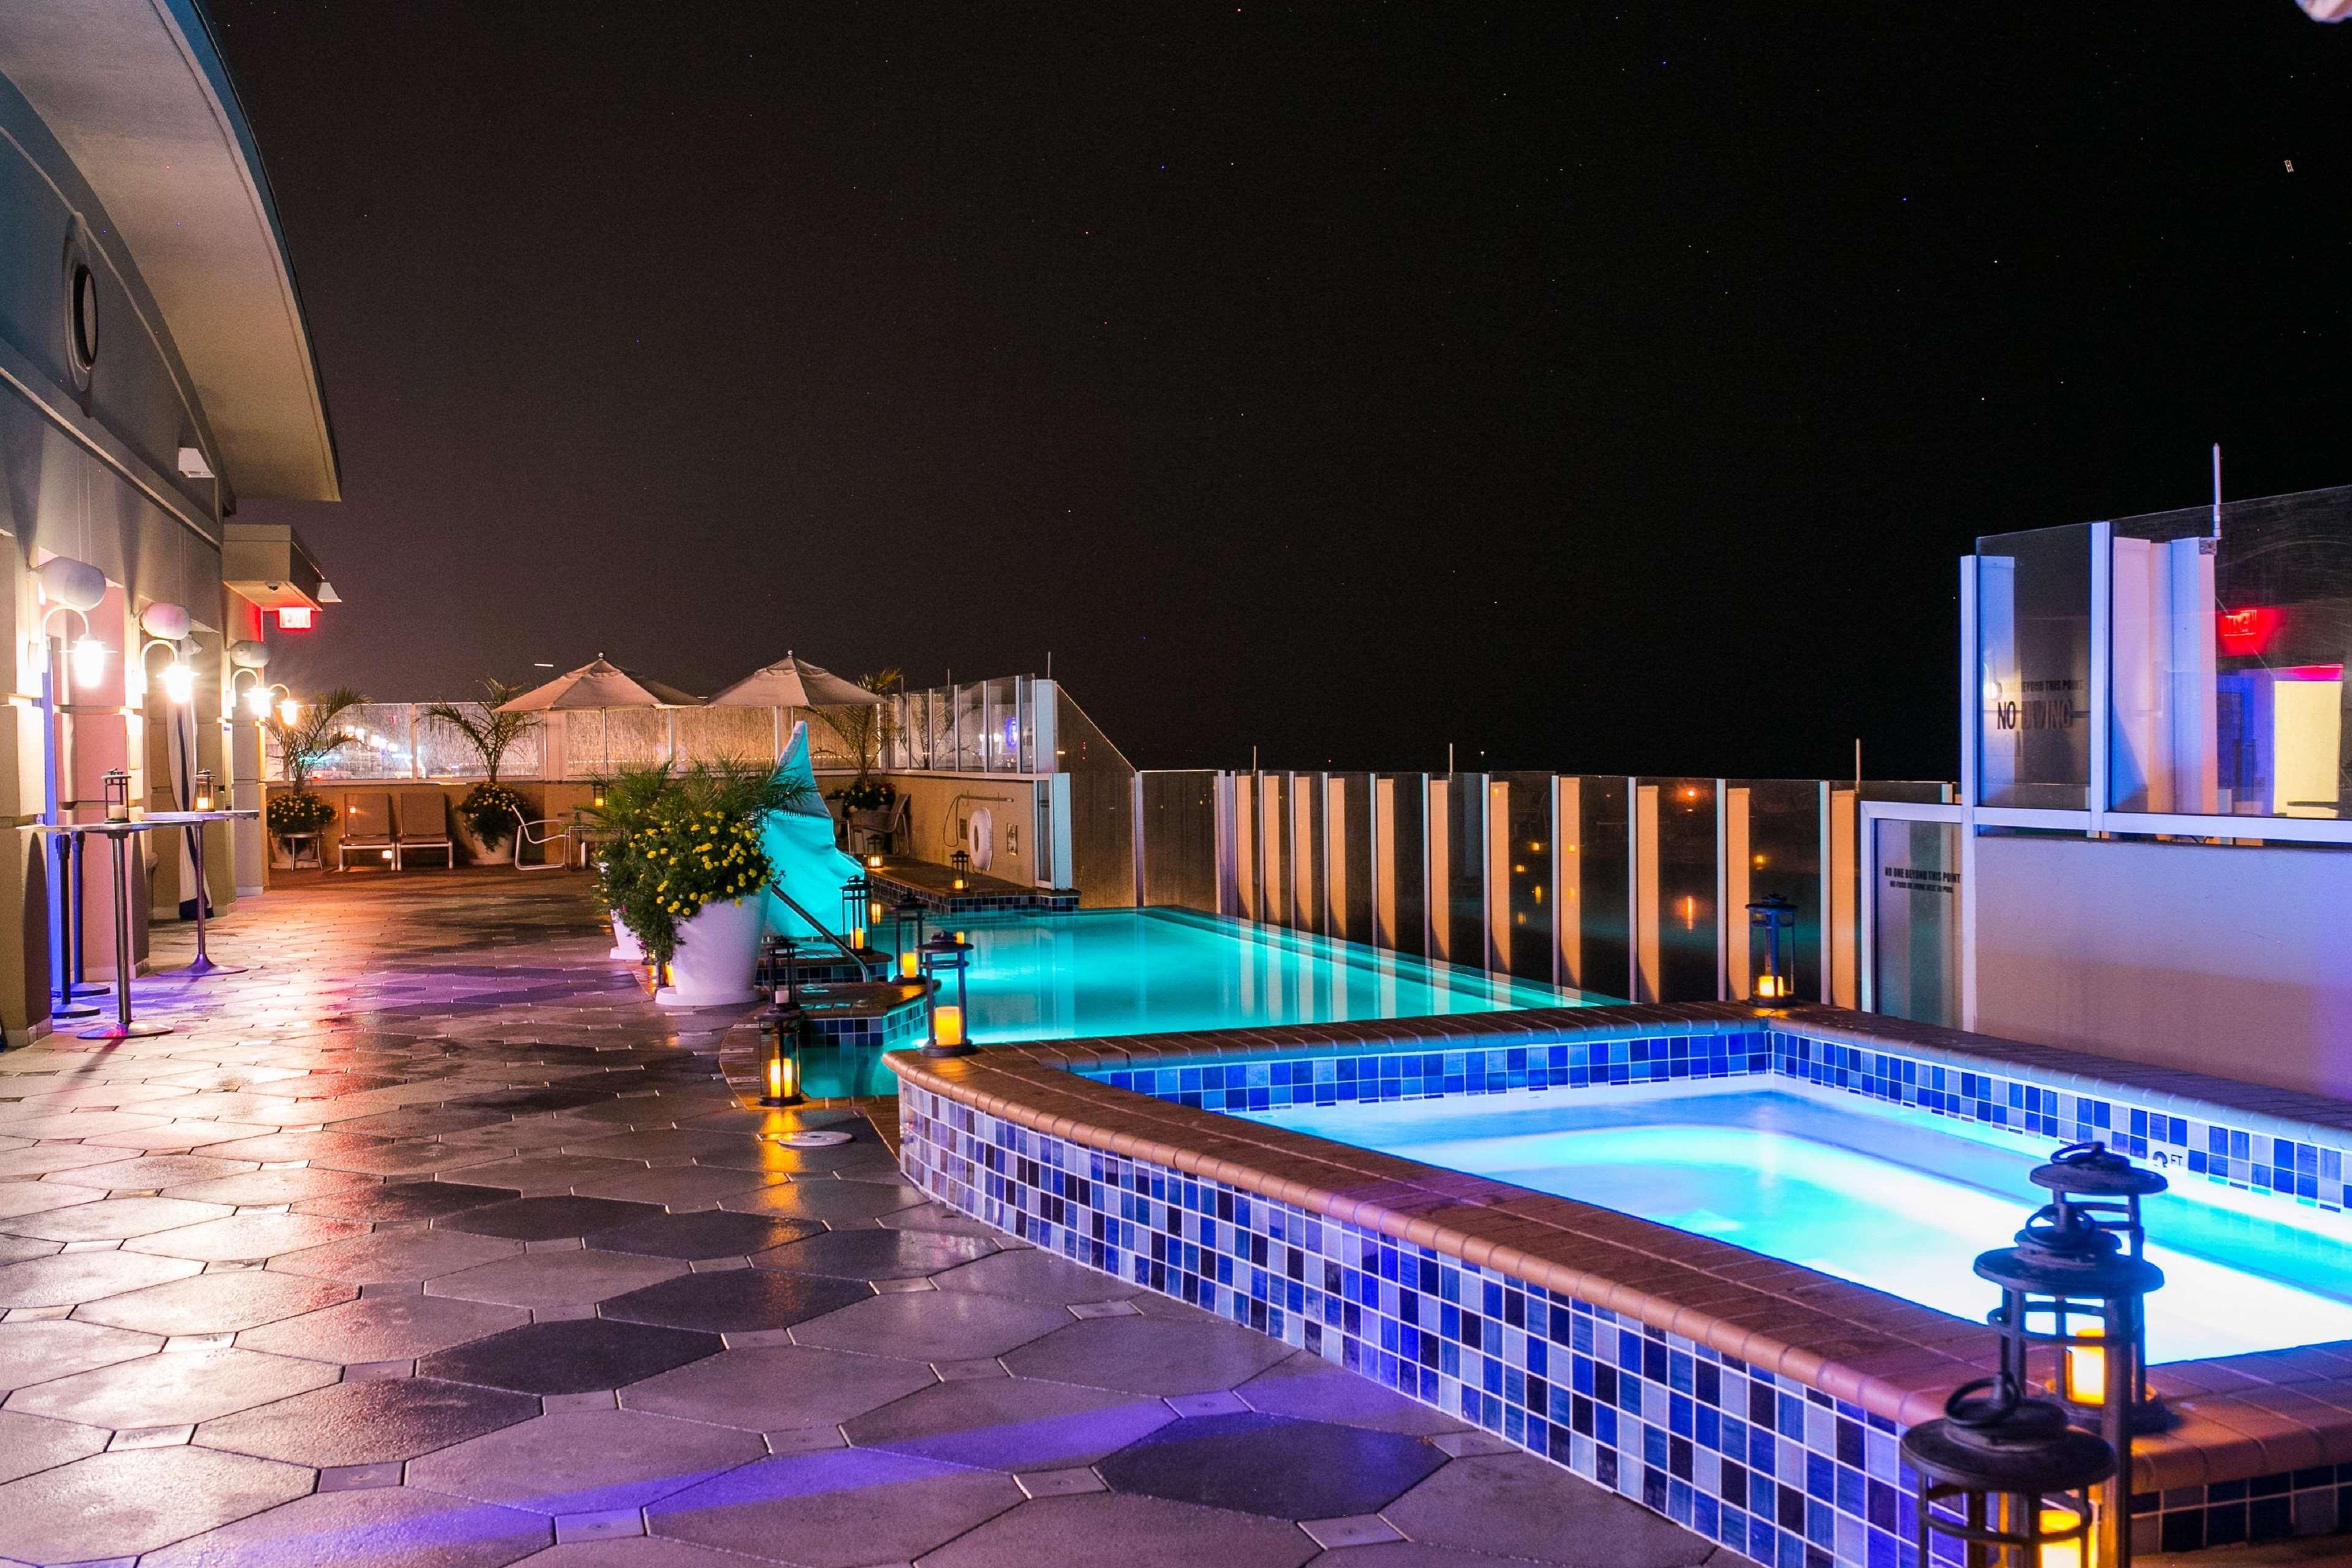 Sky Bar and Infinity Pool View